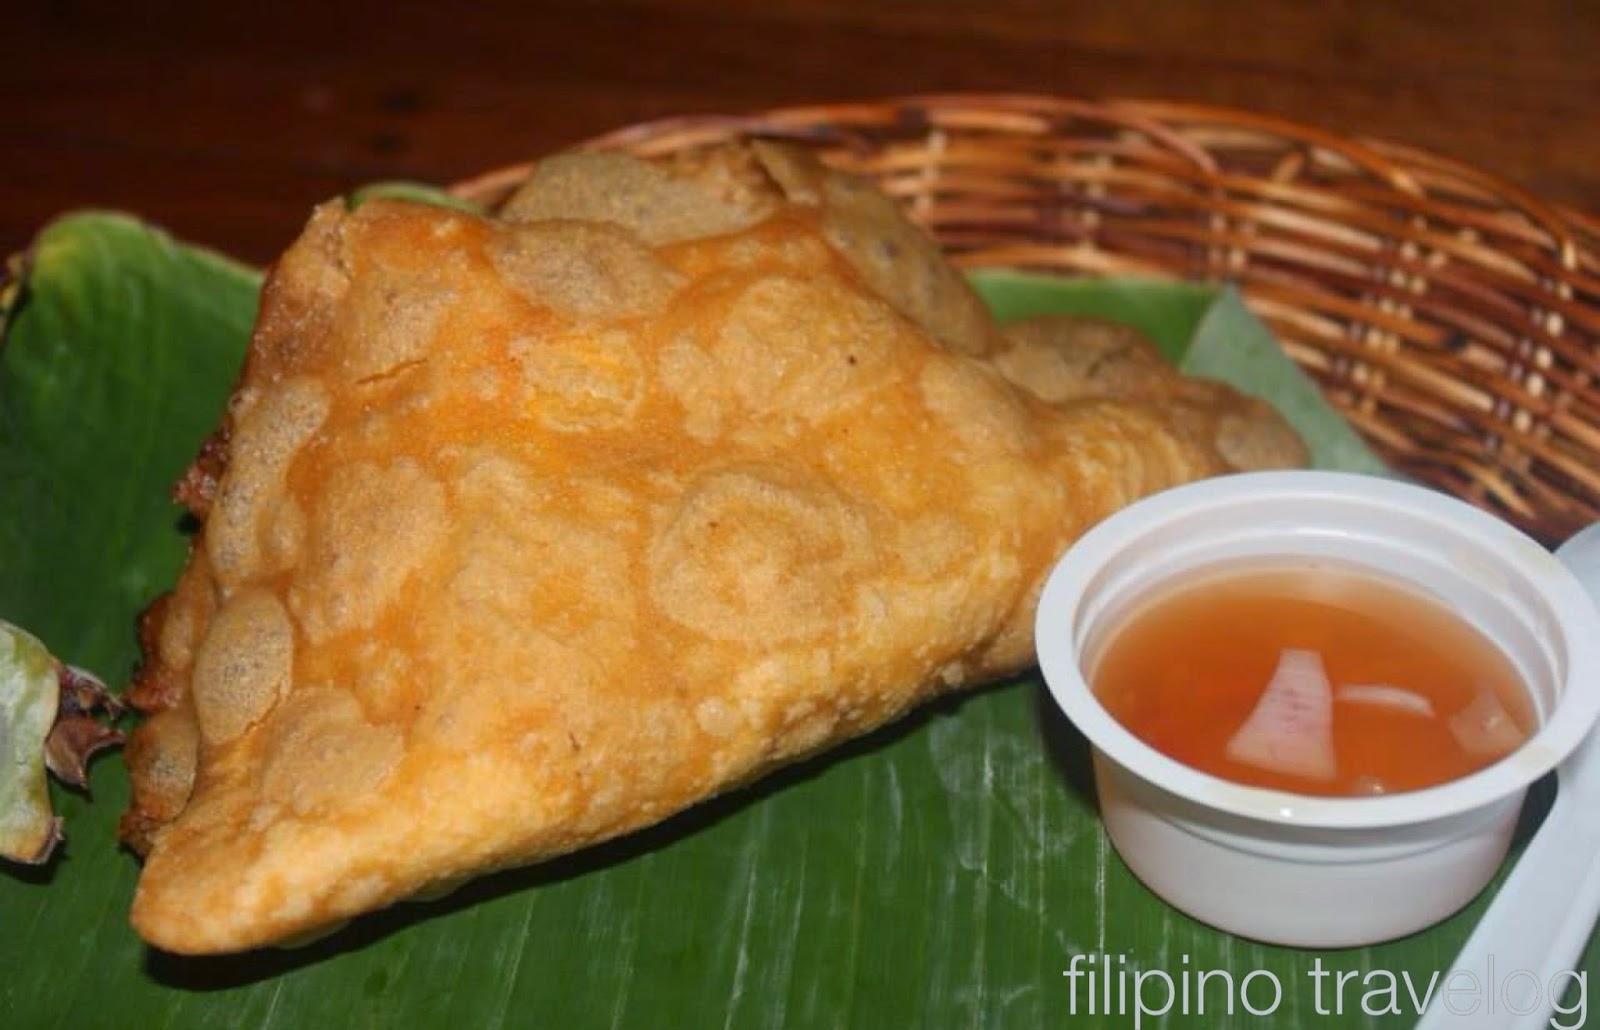 Ilocos Best Food